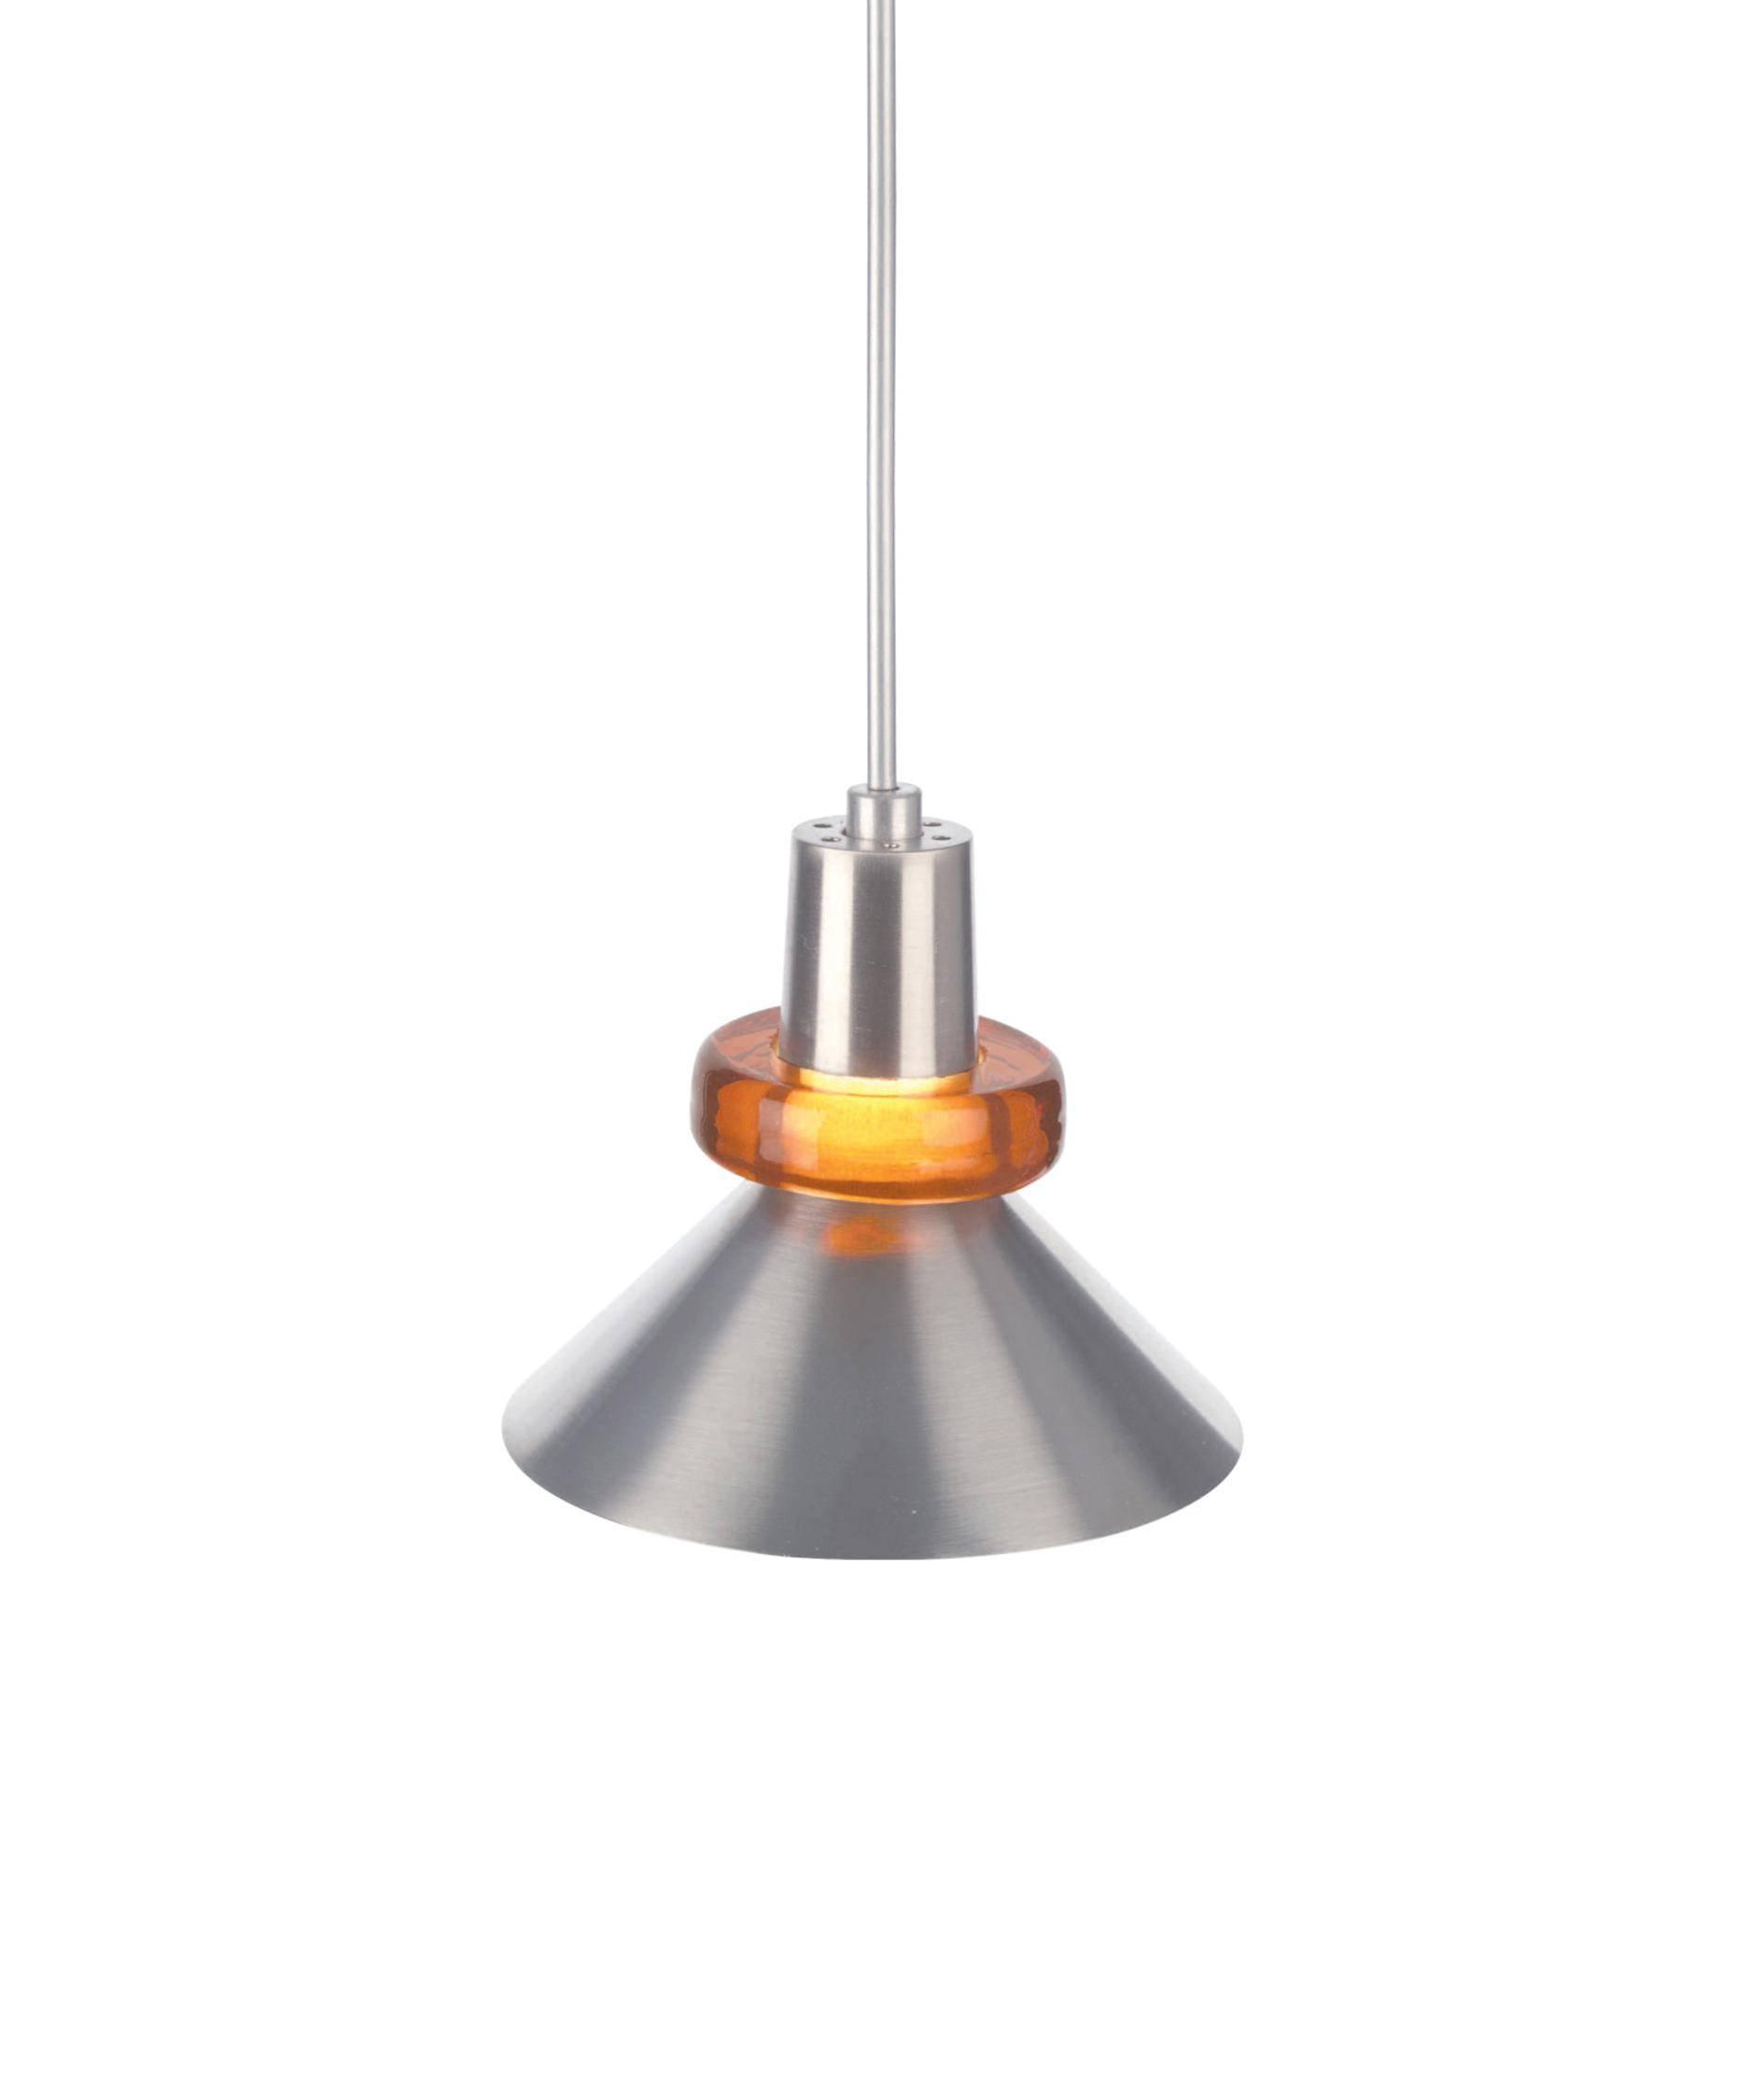 Tech Lighting 700wks Hanging Wok 3 Inch Wide 1 Light Mini Pendant Regarding Mini Pendant Lights (View 2 of 15)